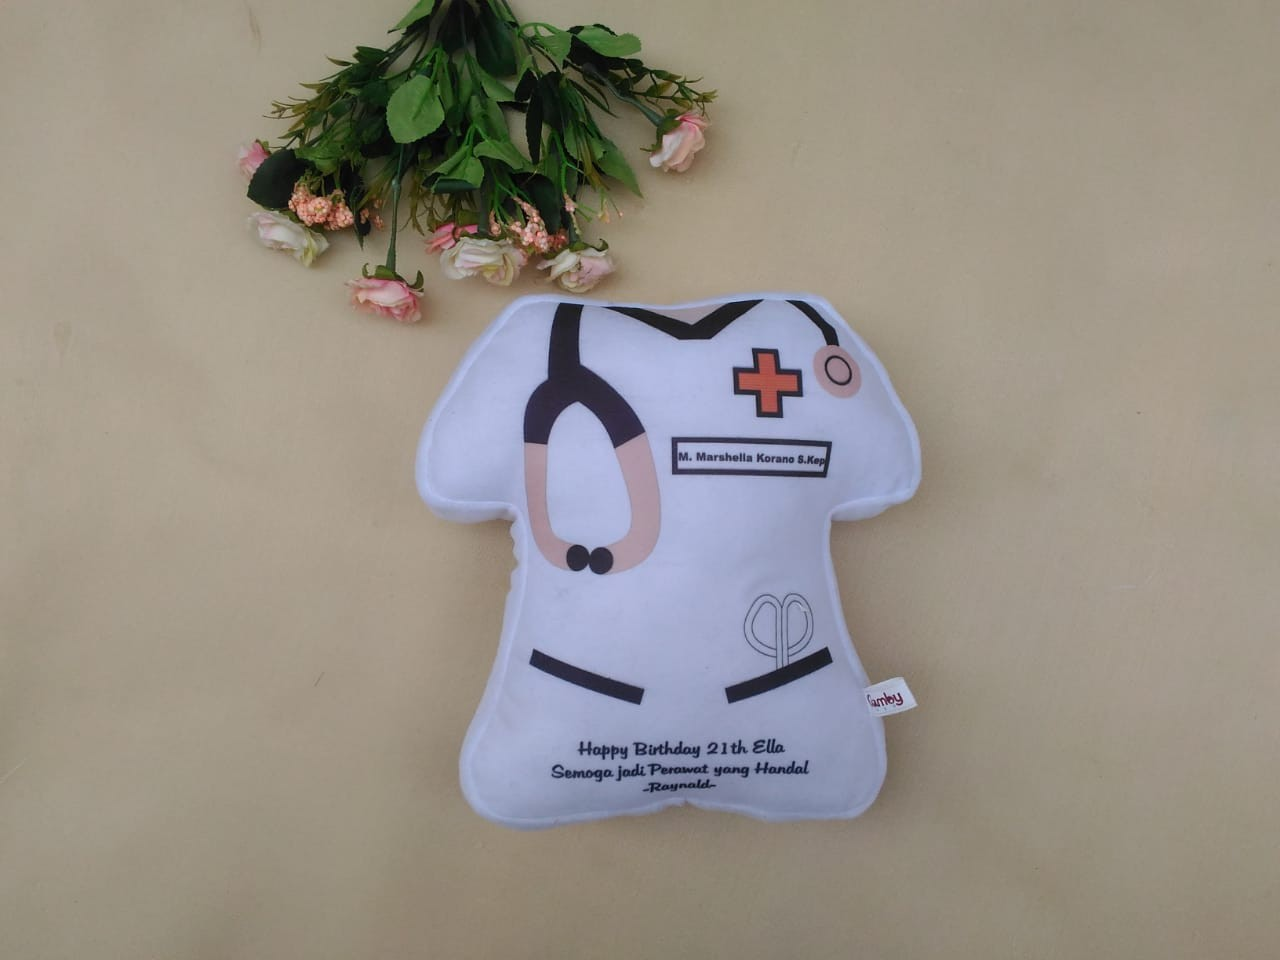 Produsen Bantal Souvenir Rumah Sakit dan Klinik